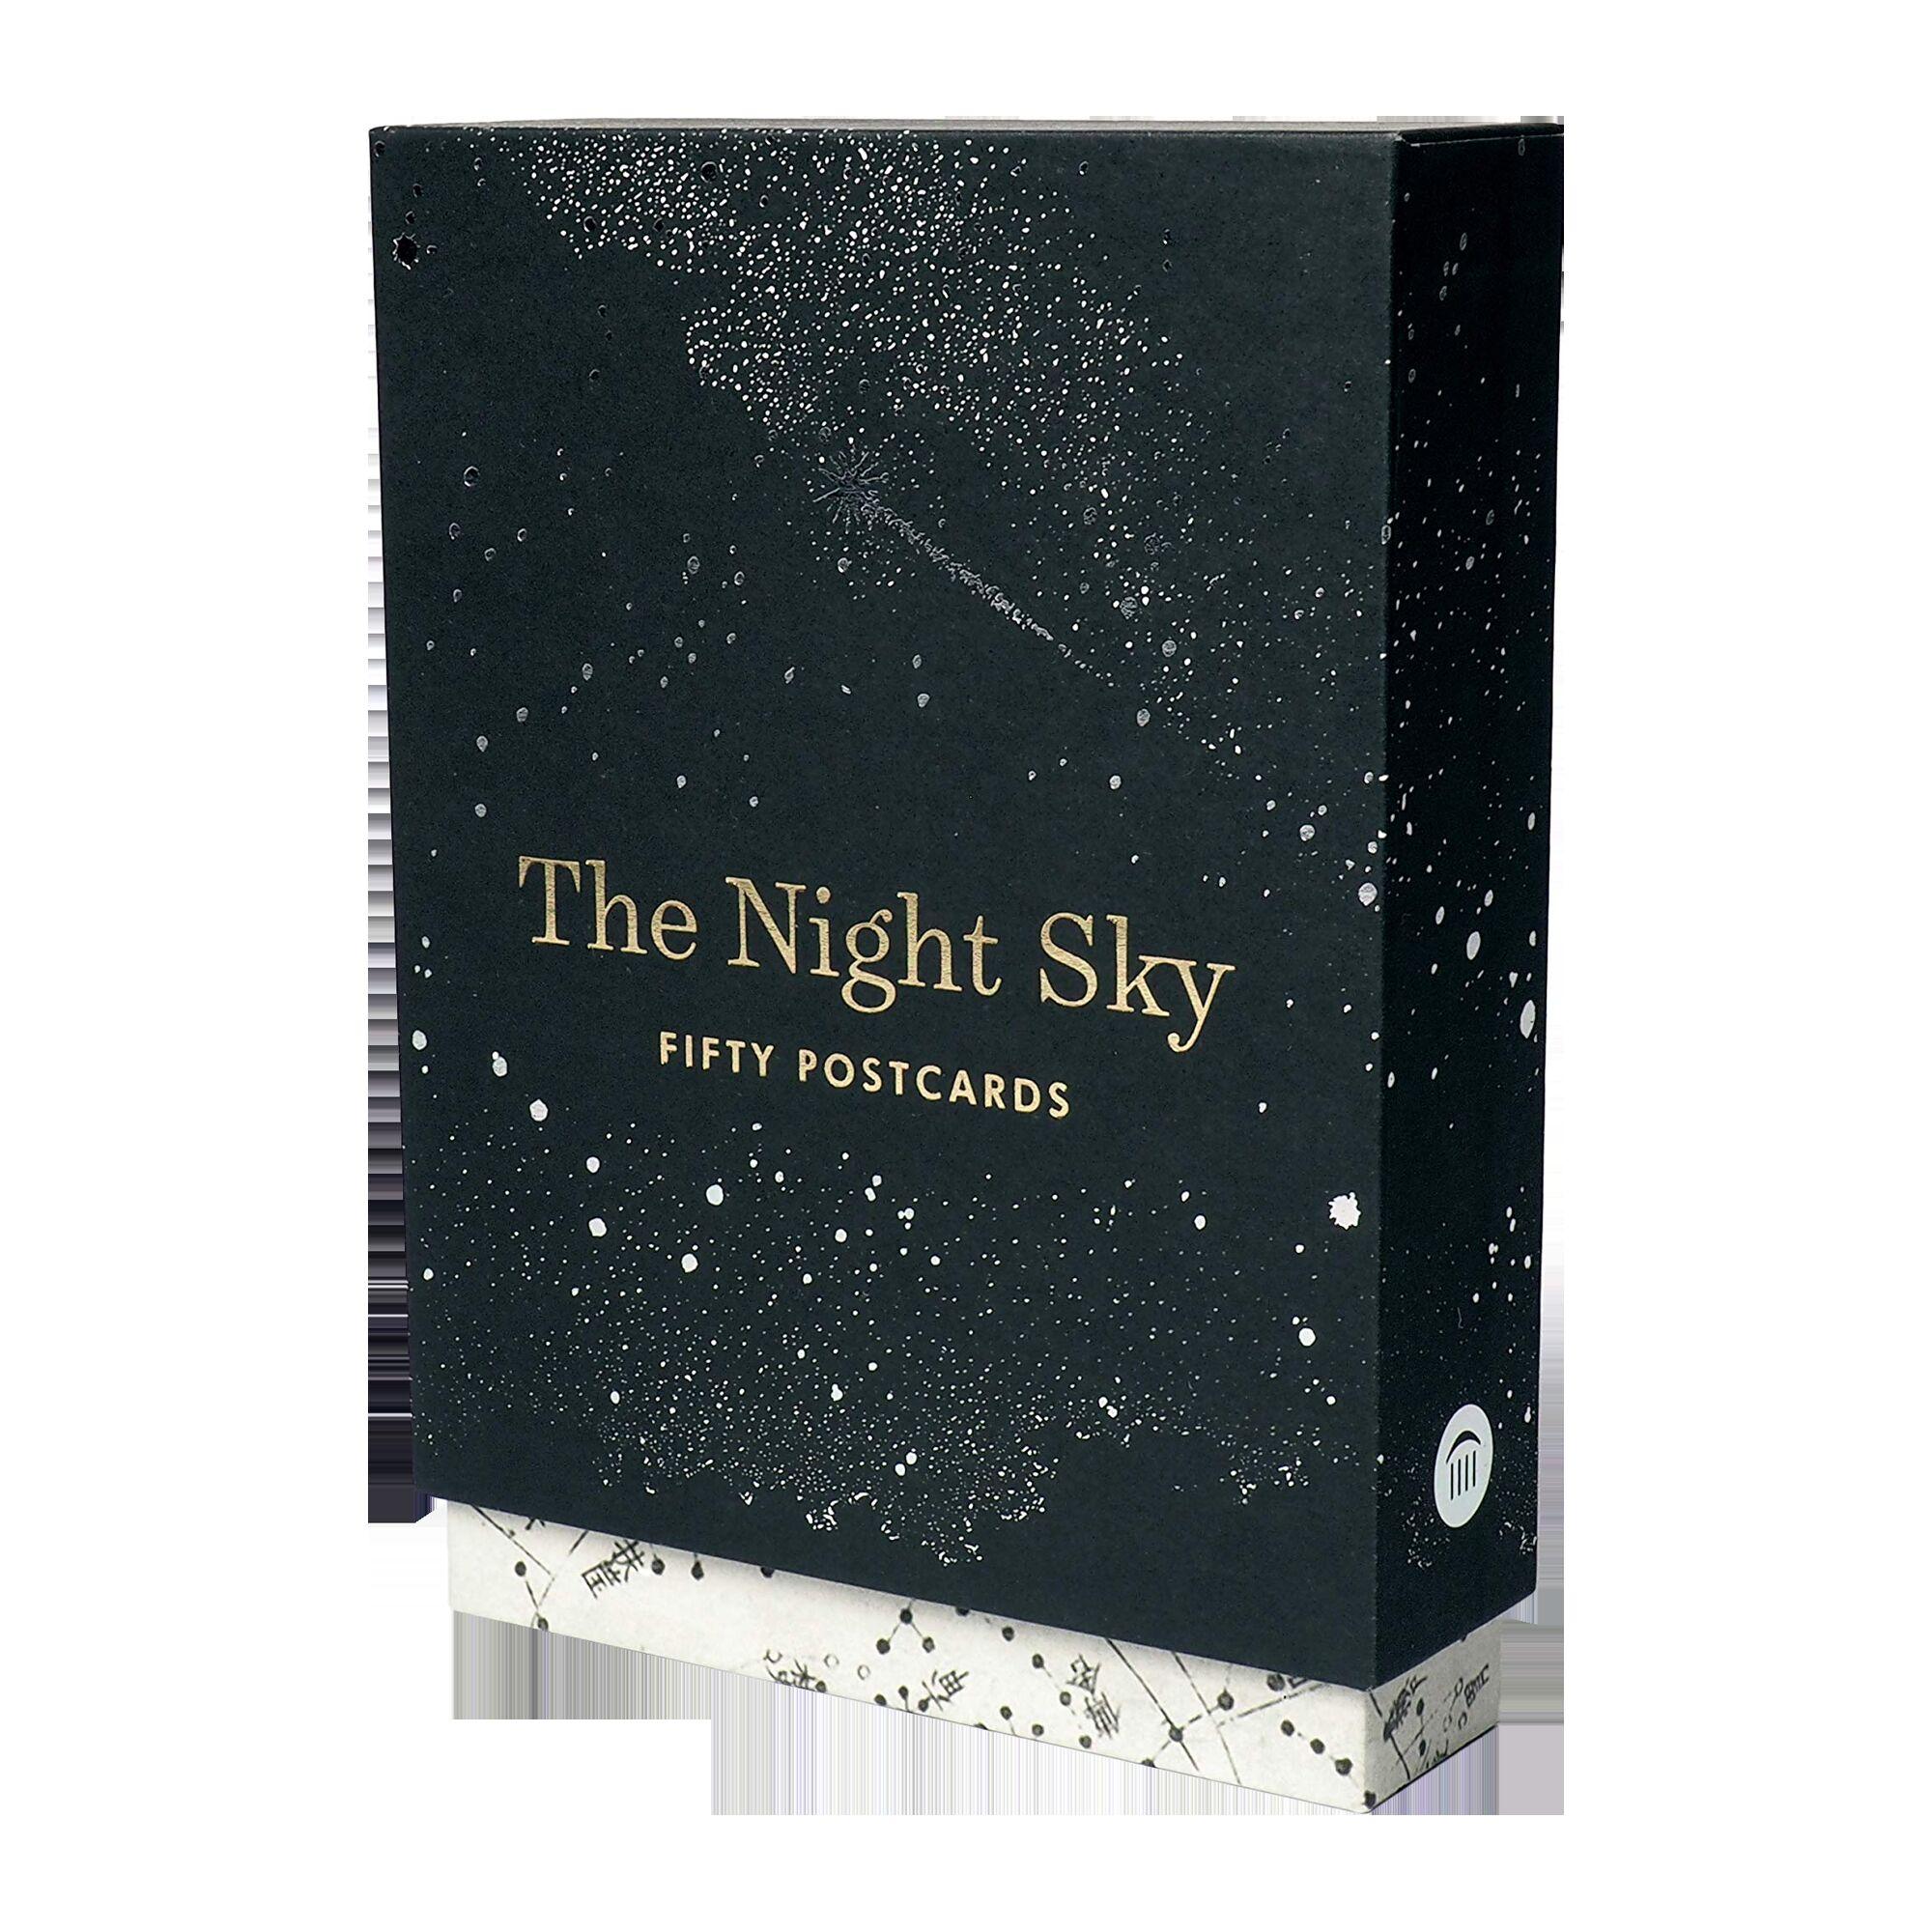 The Night Sky Postcards: 50 Postcards